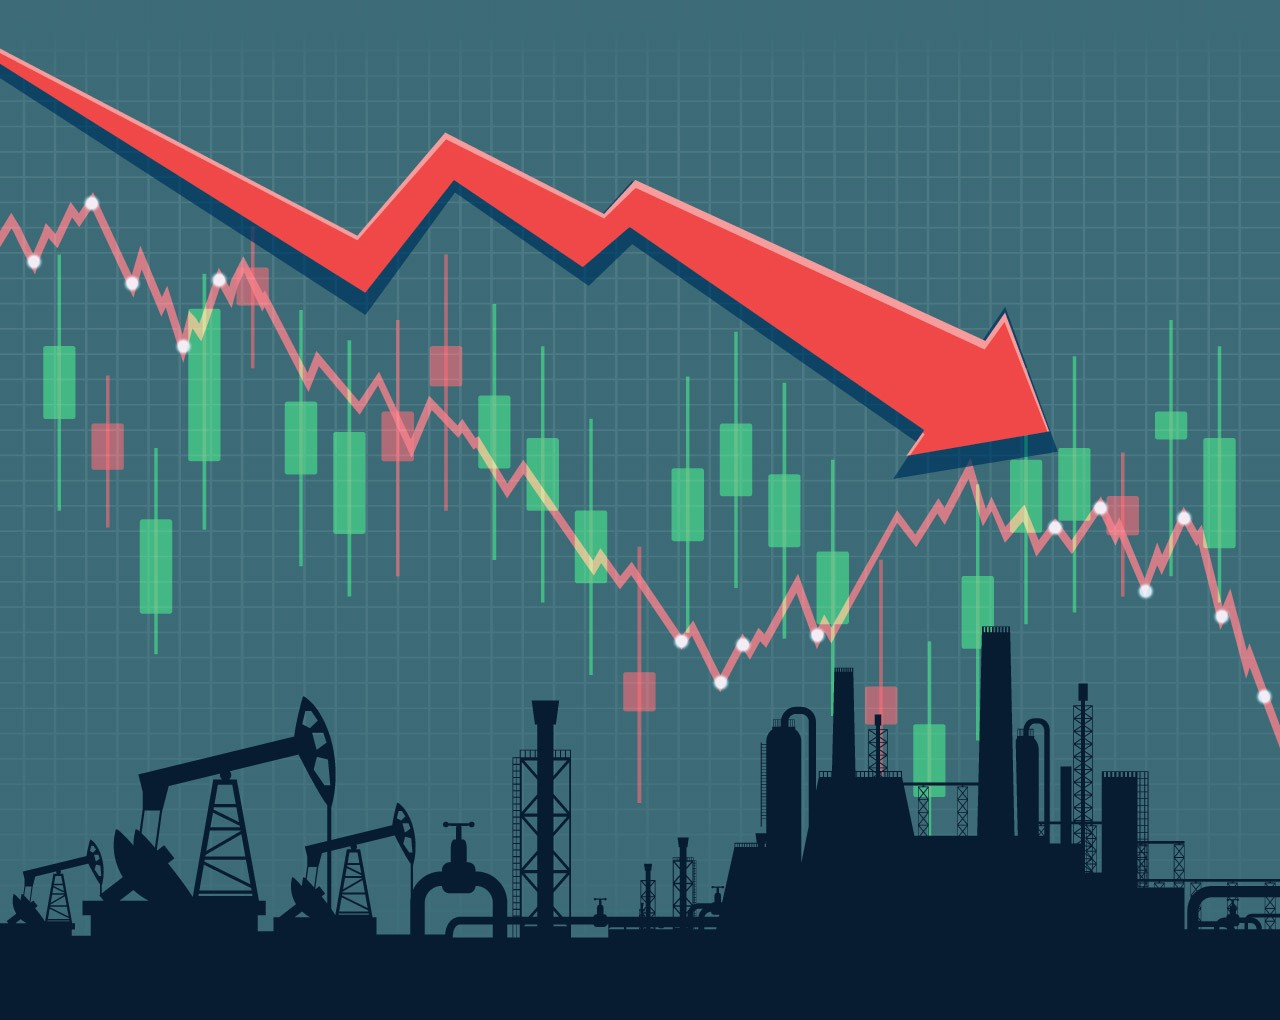 Baril de petrole